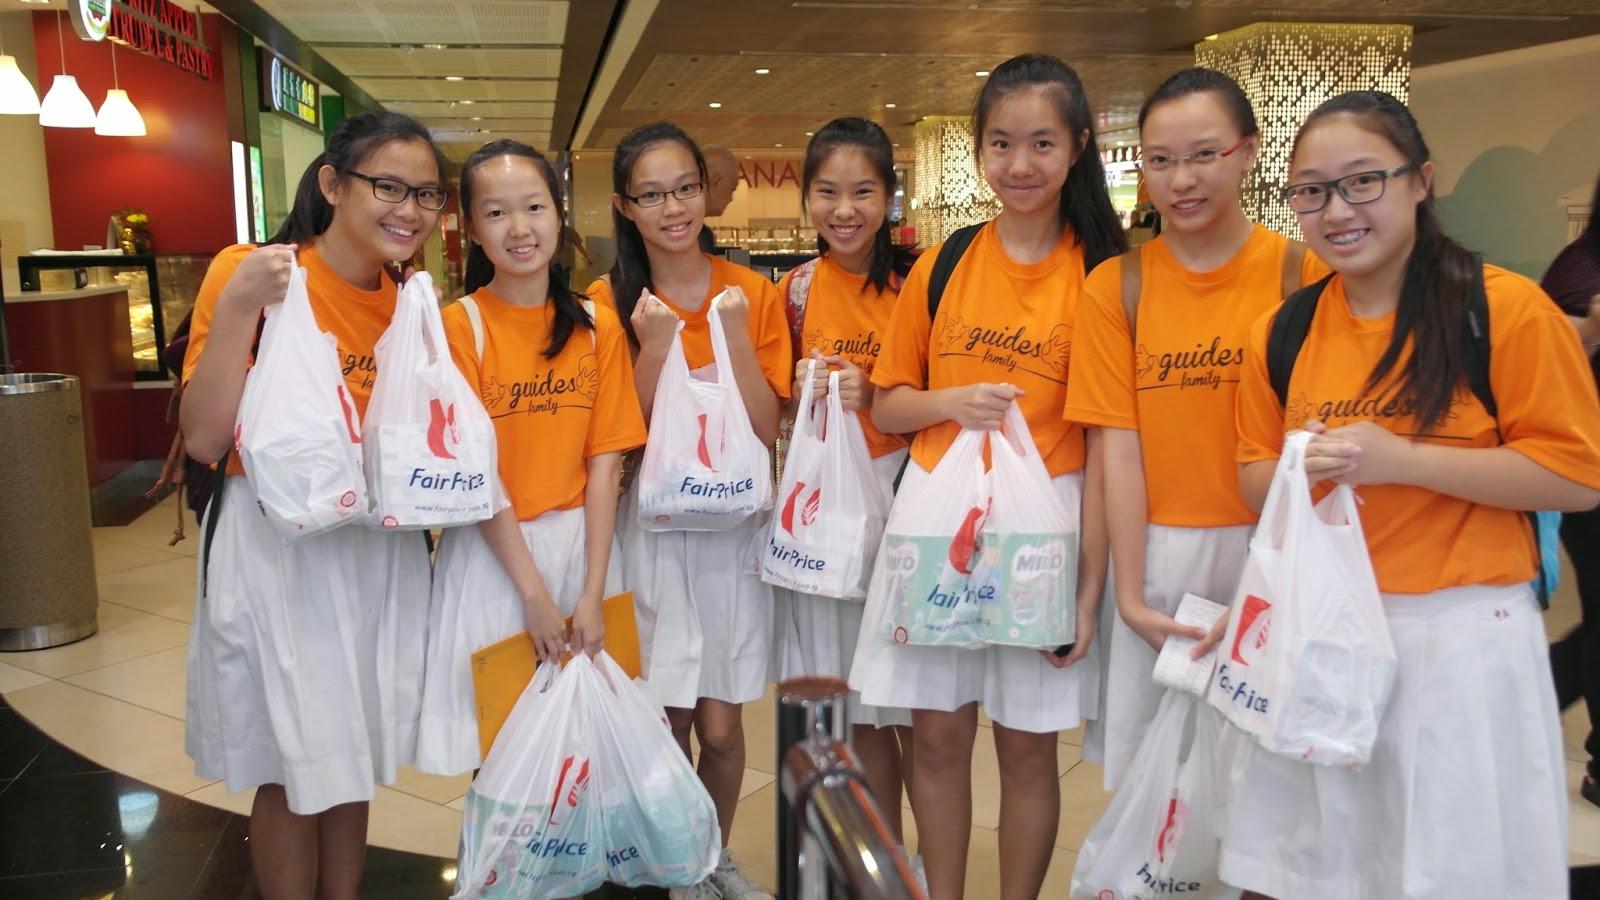 SSU Singapore School Uniforms: CCHMS Chung Cheng High ...